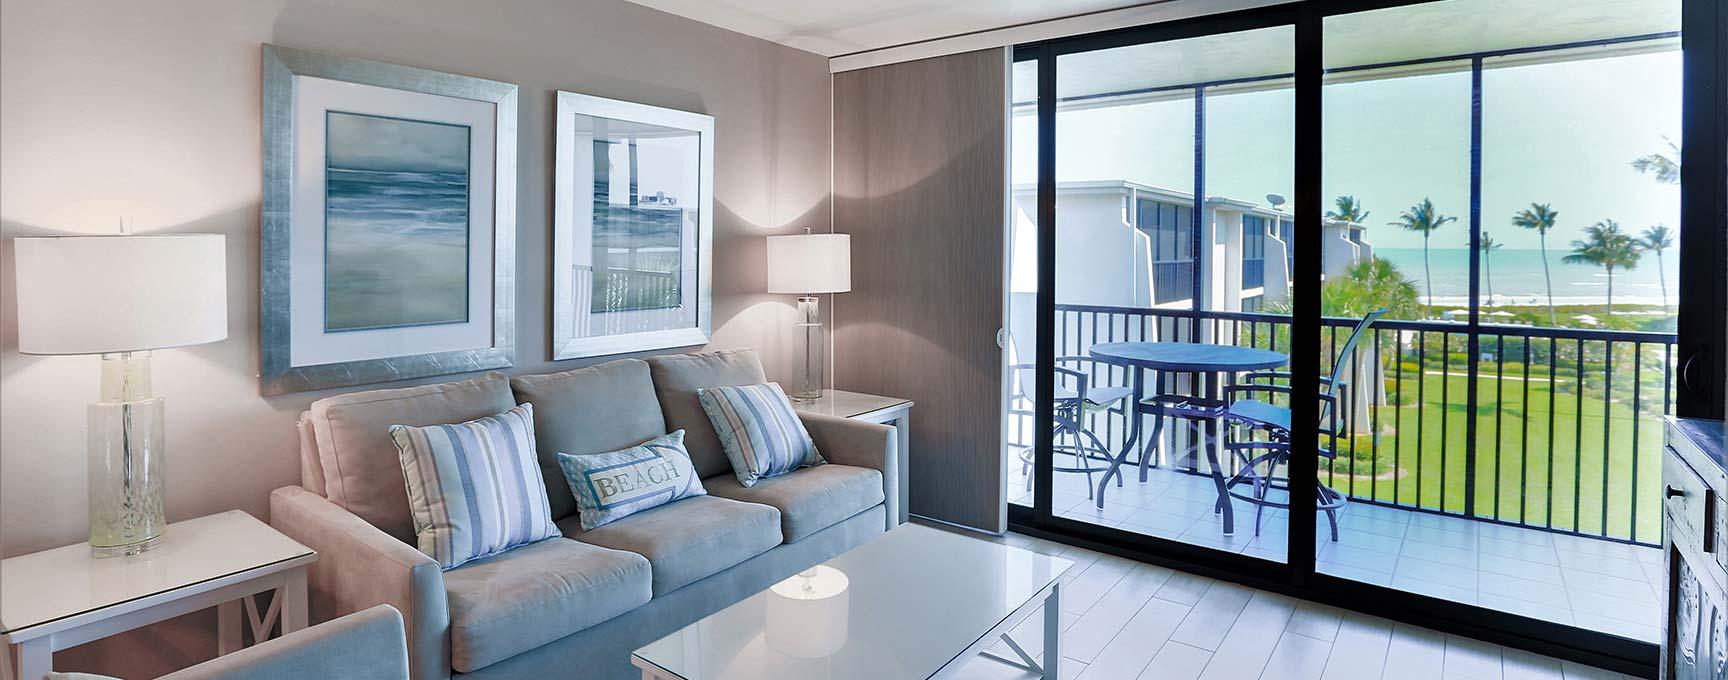 Two Bedroom - Sanibel Luxury Accommodations | Florida Family Vacation